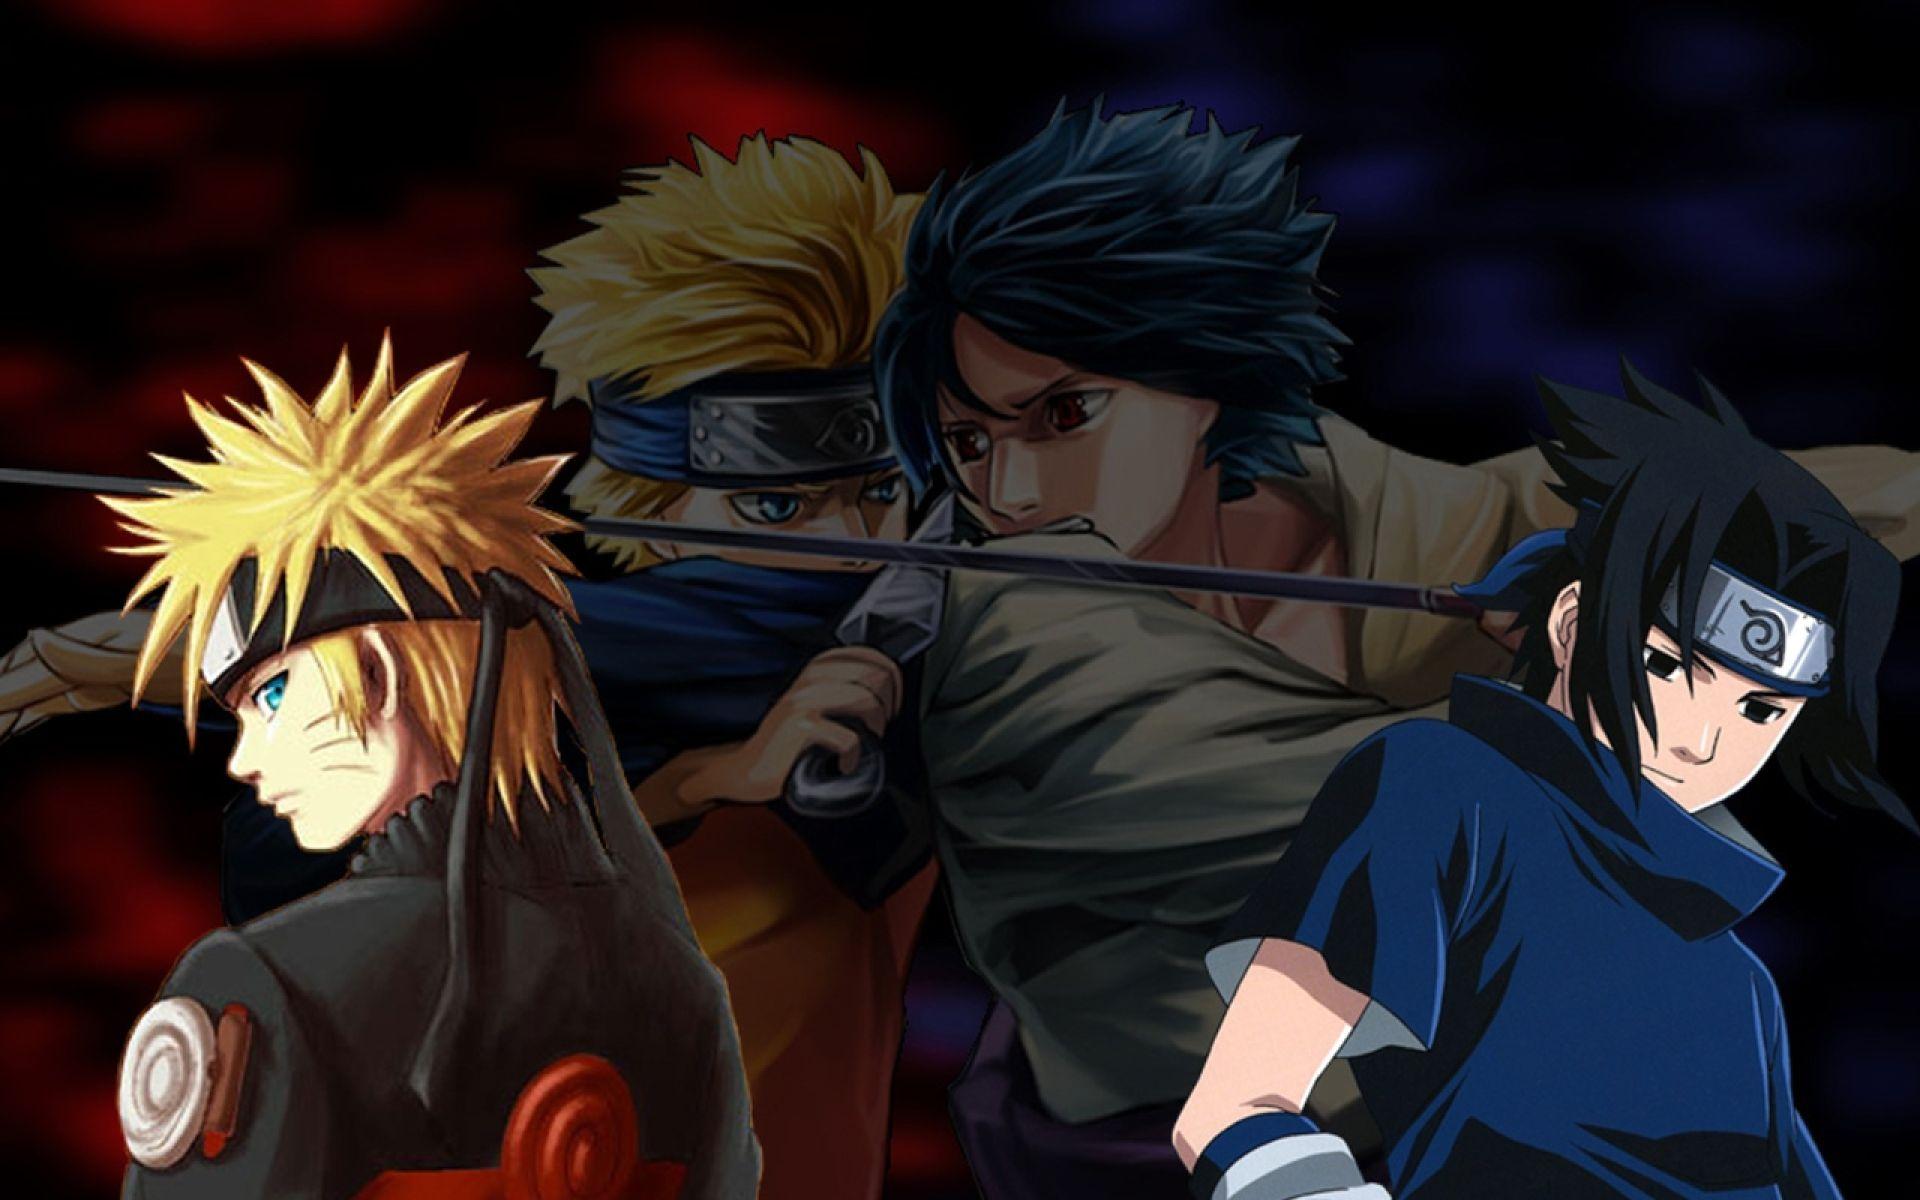 Naruto and Sasuke, Pic